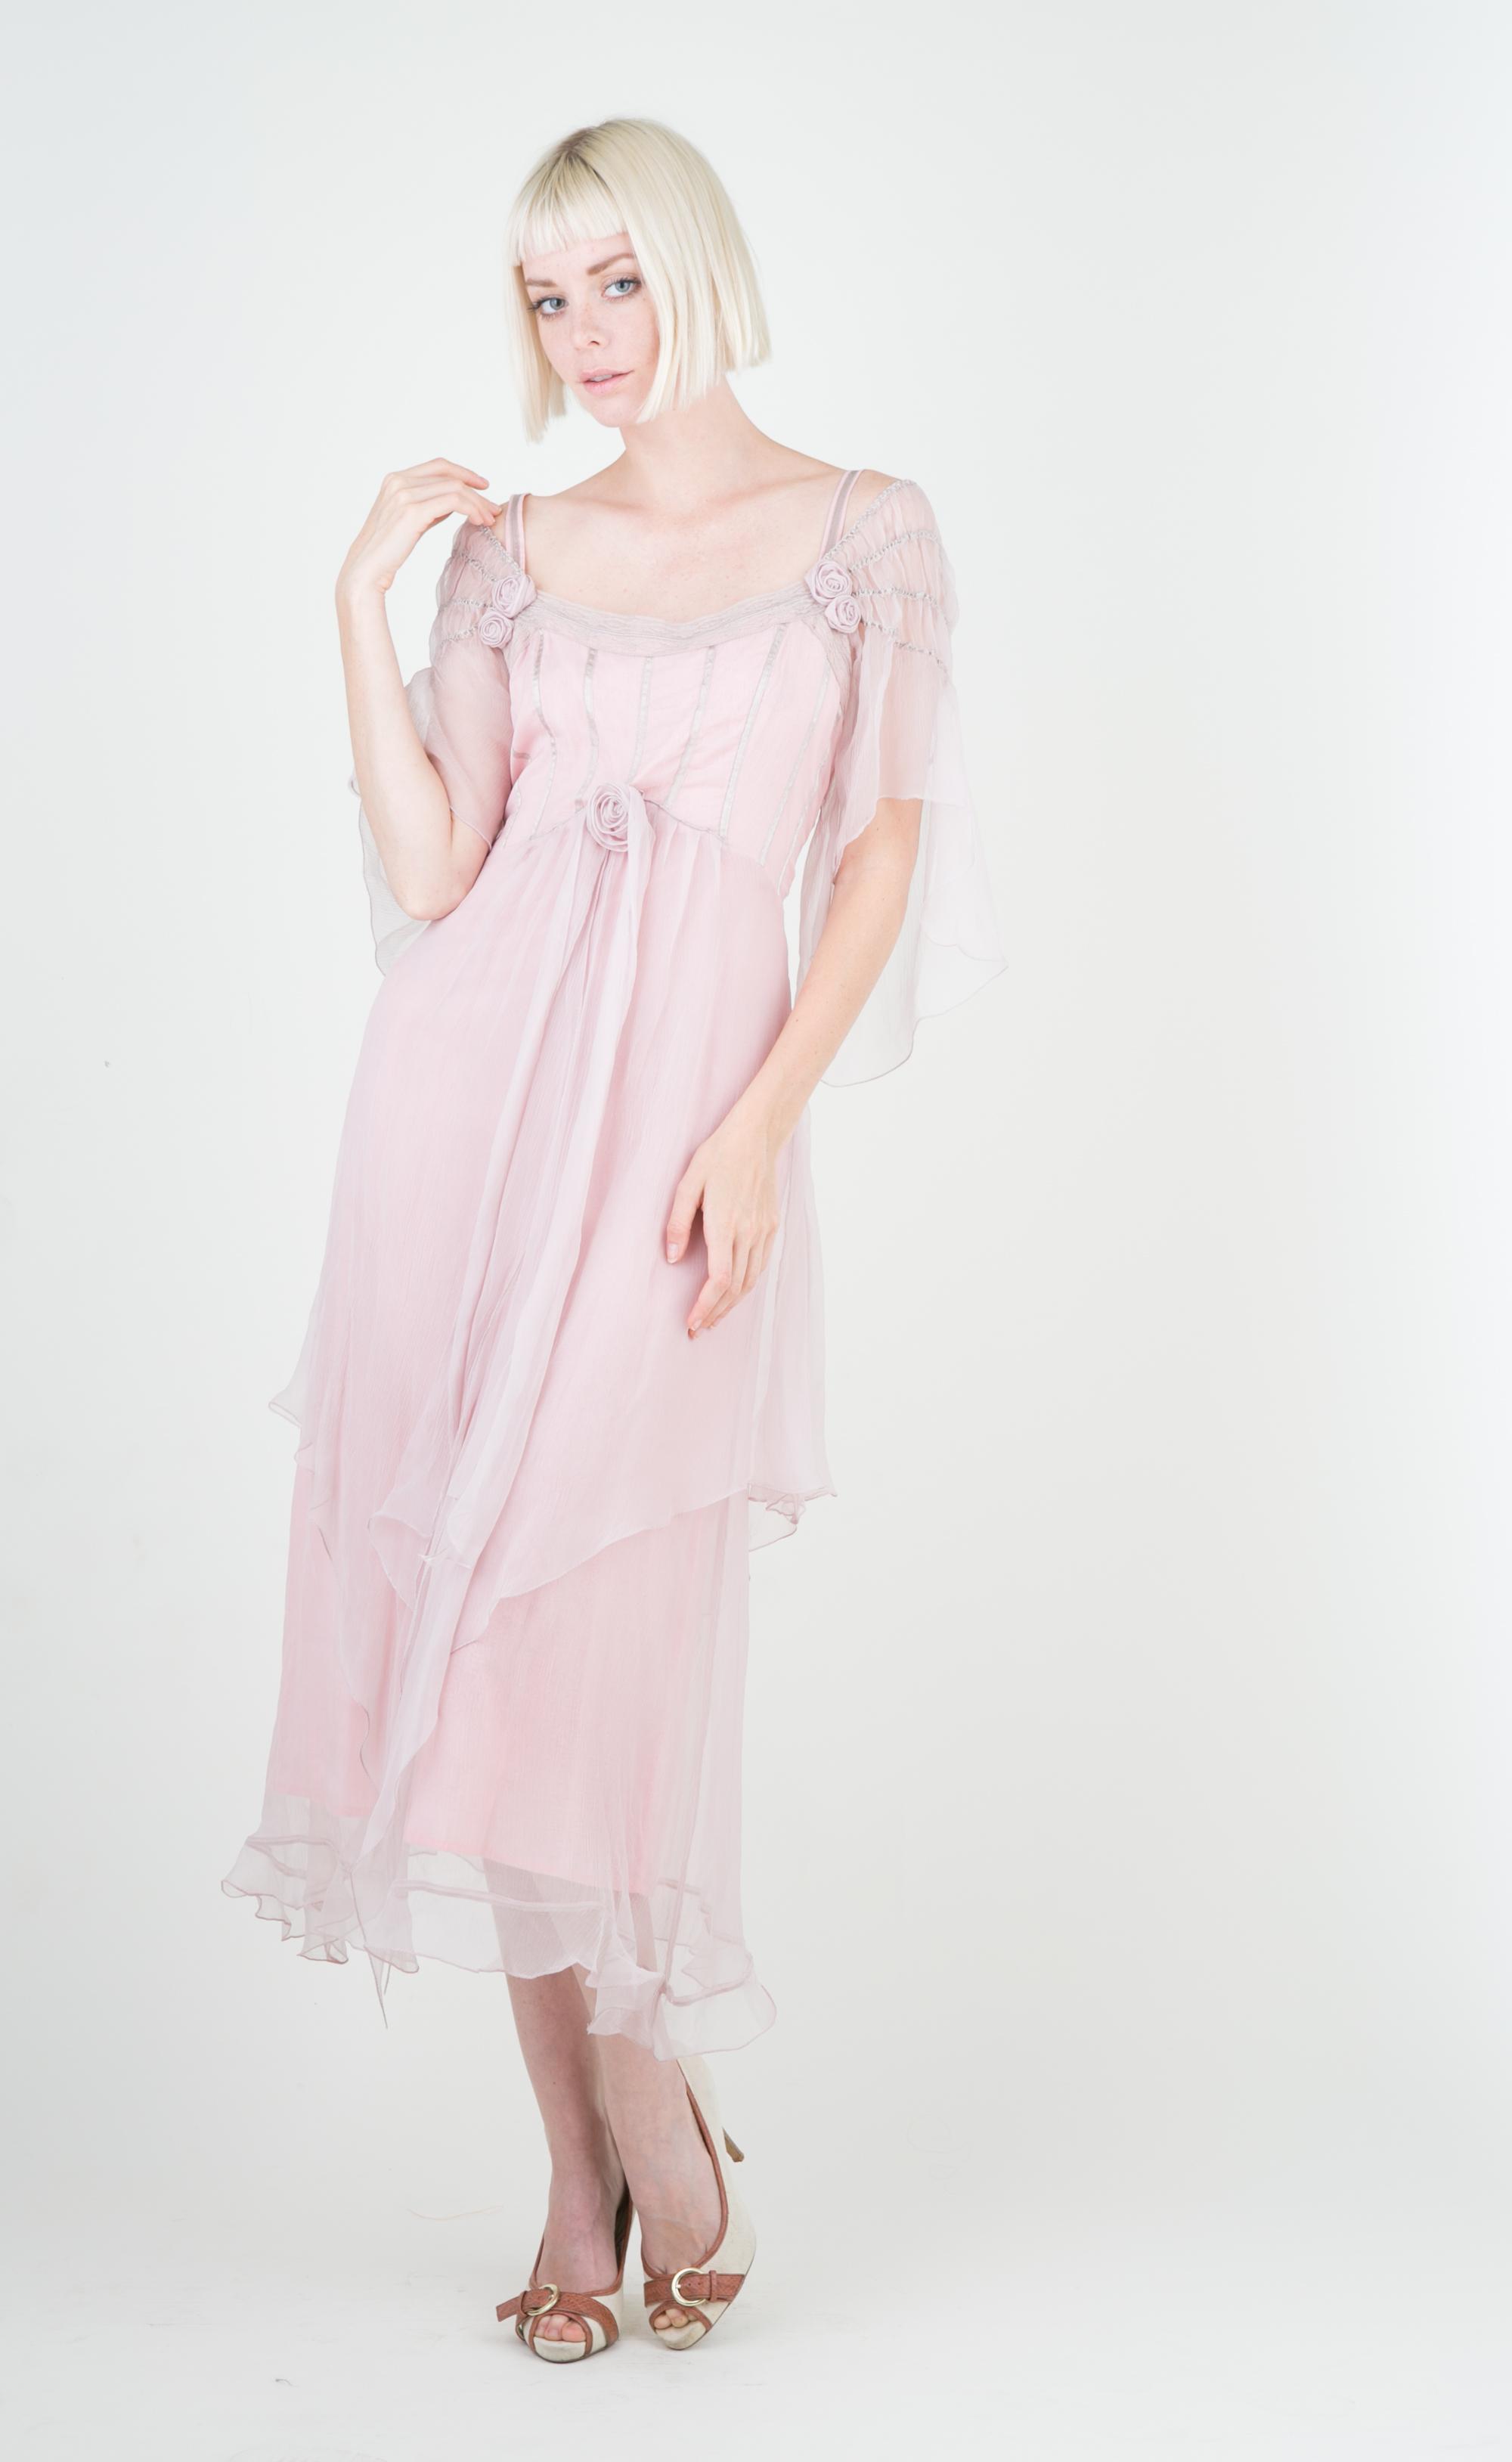 Rose-Colored Dresses